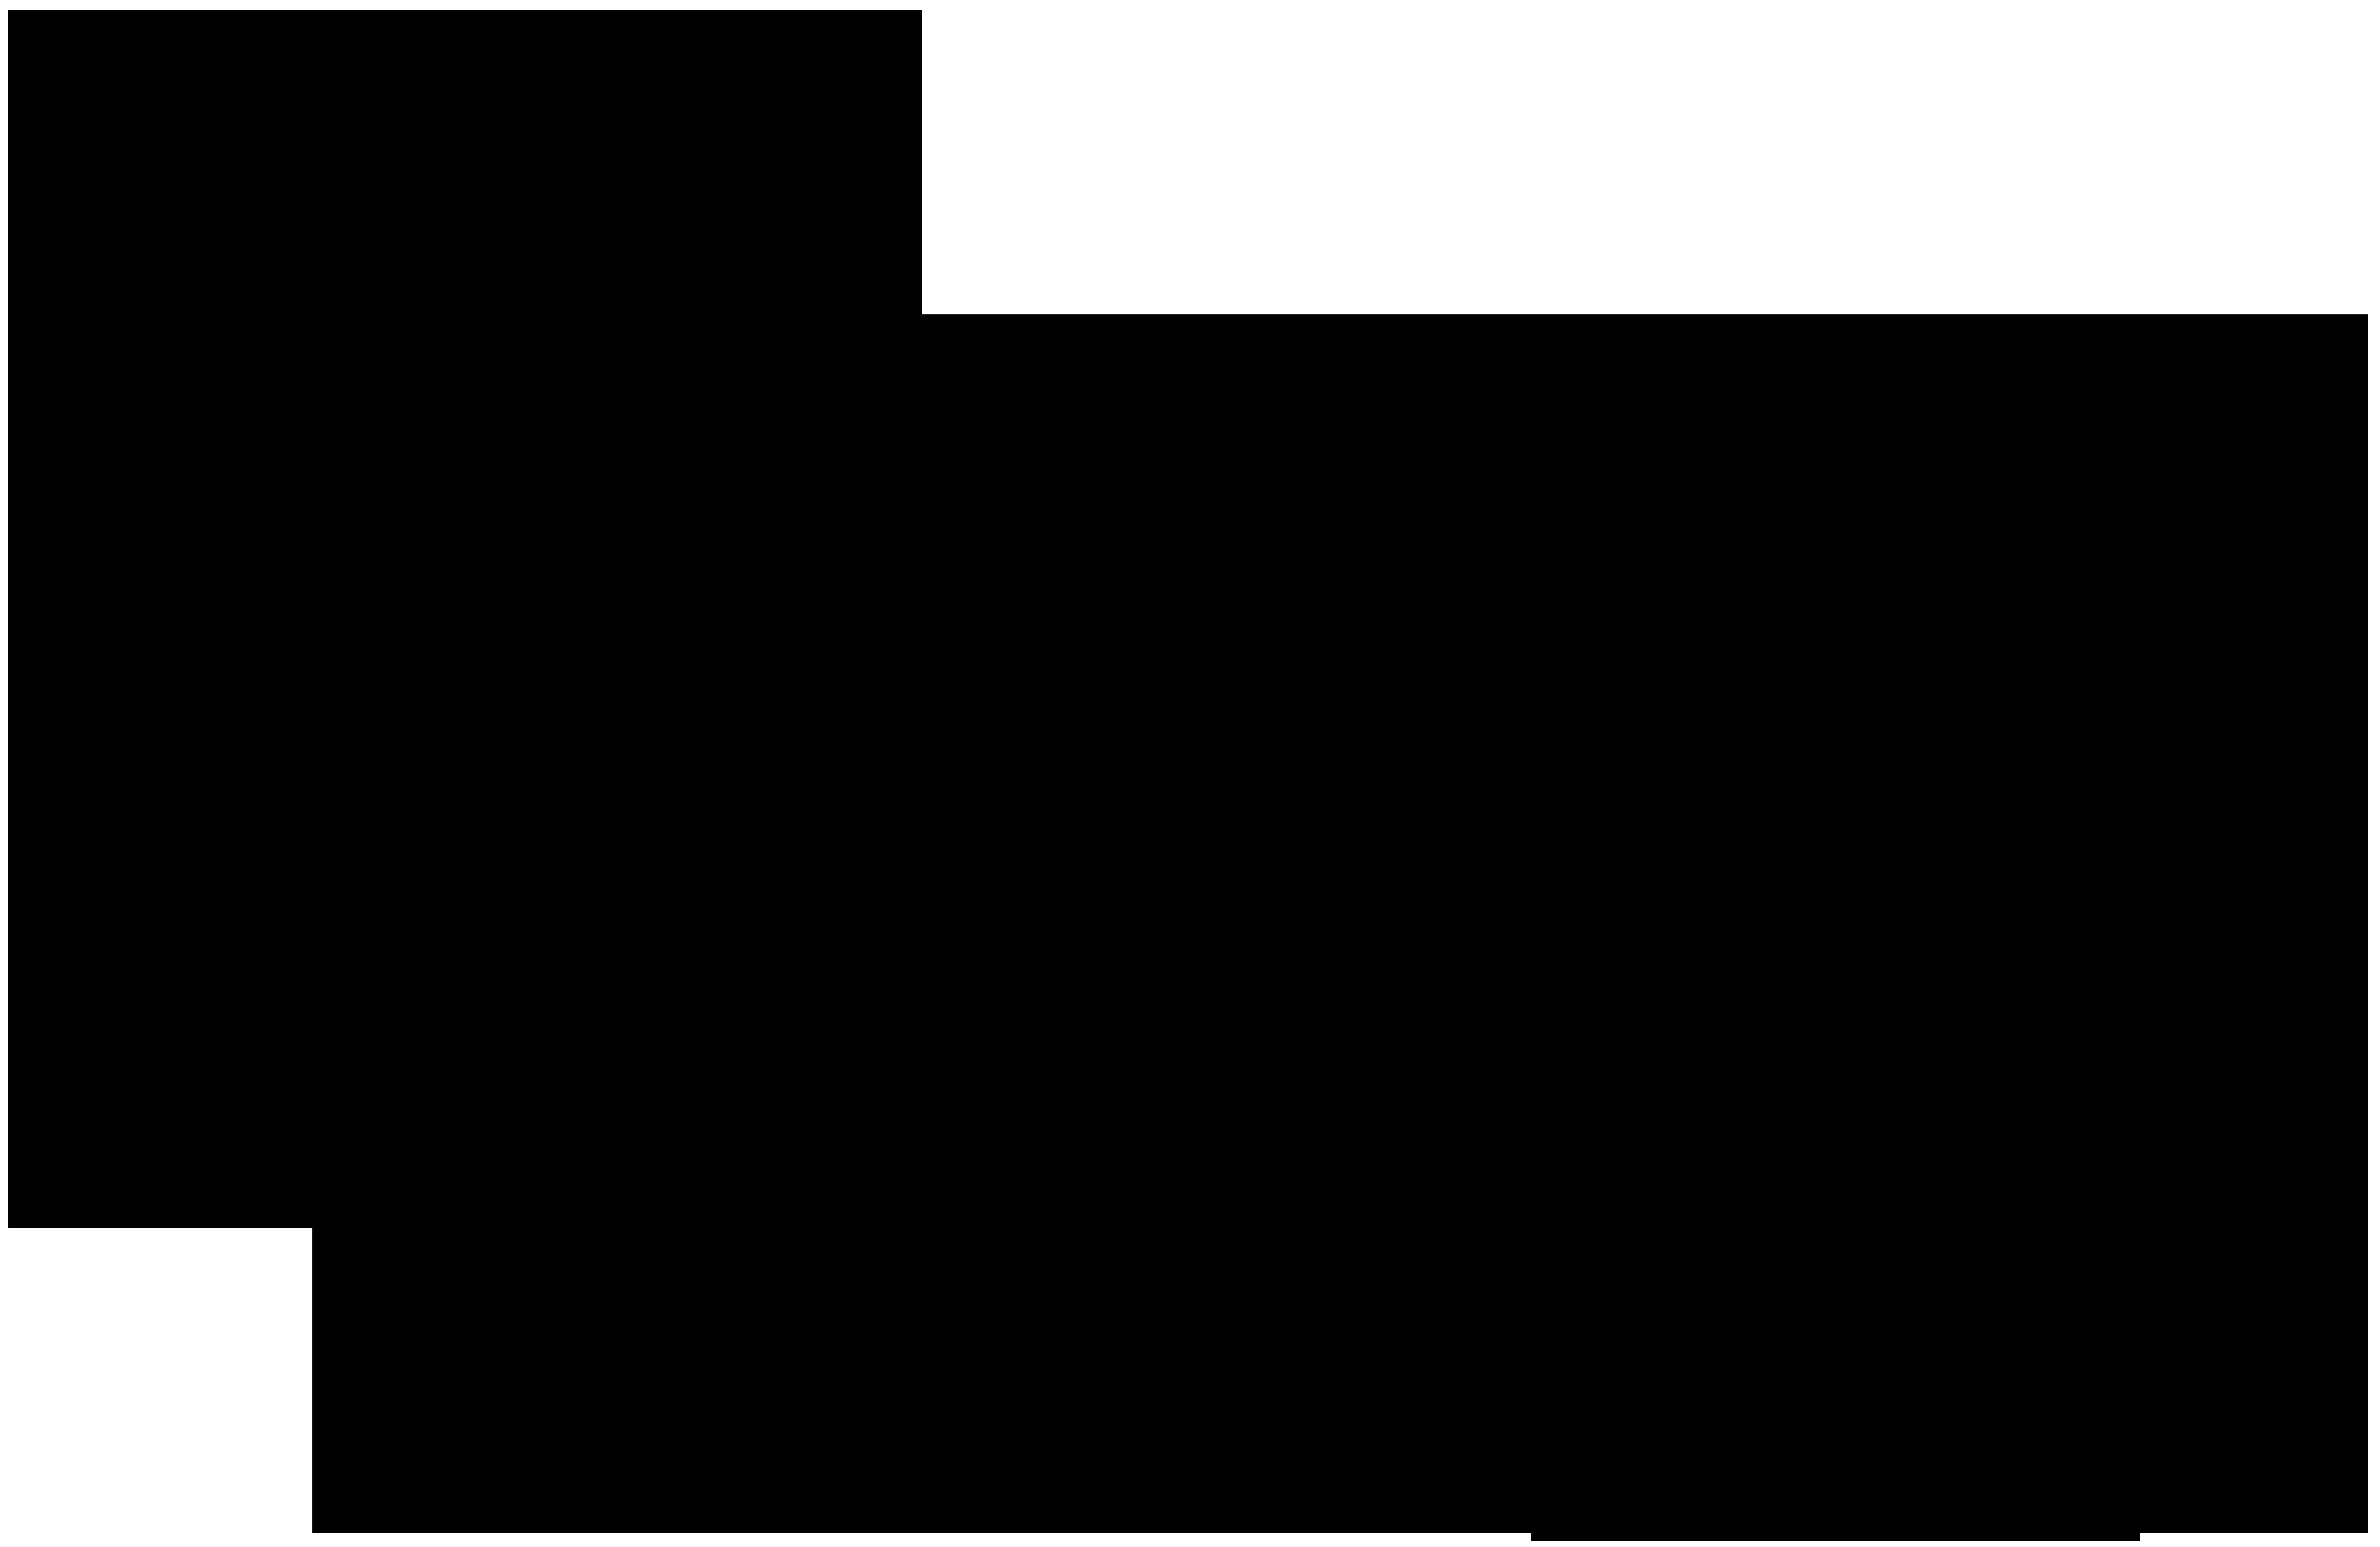 Hippopotamus Silhouette PNG Clip Art Image.